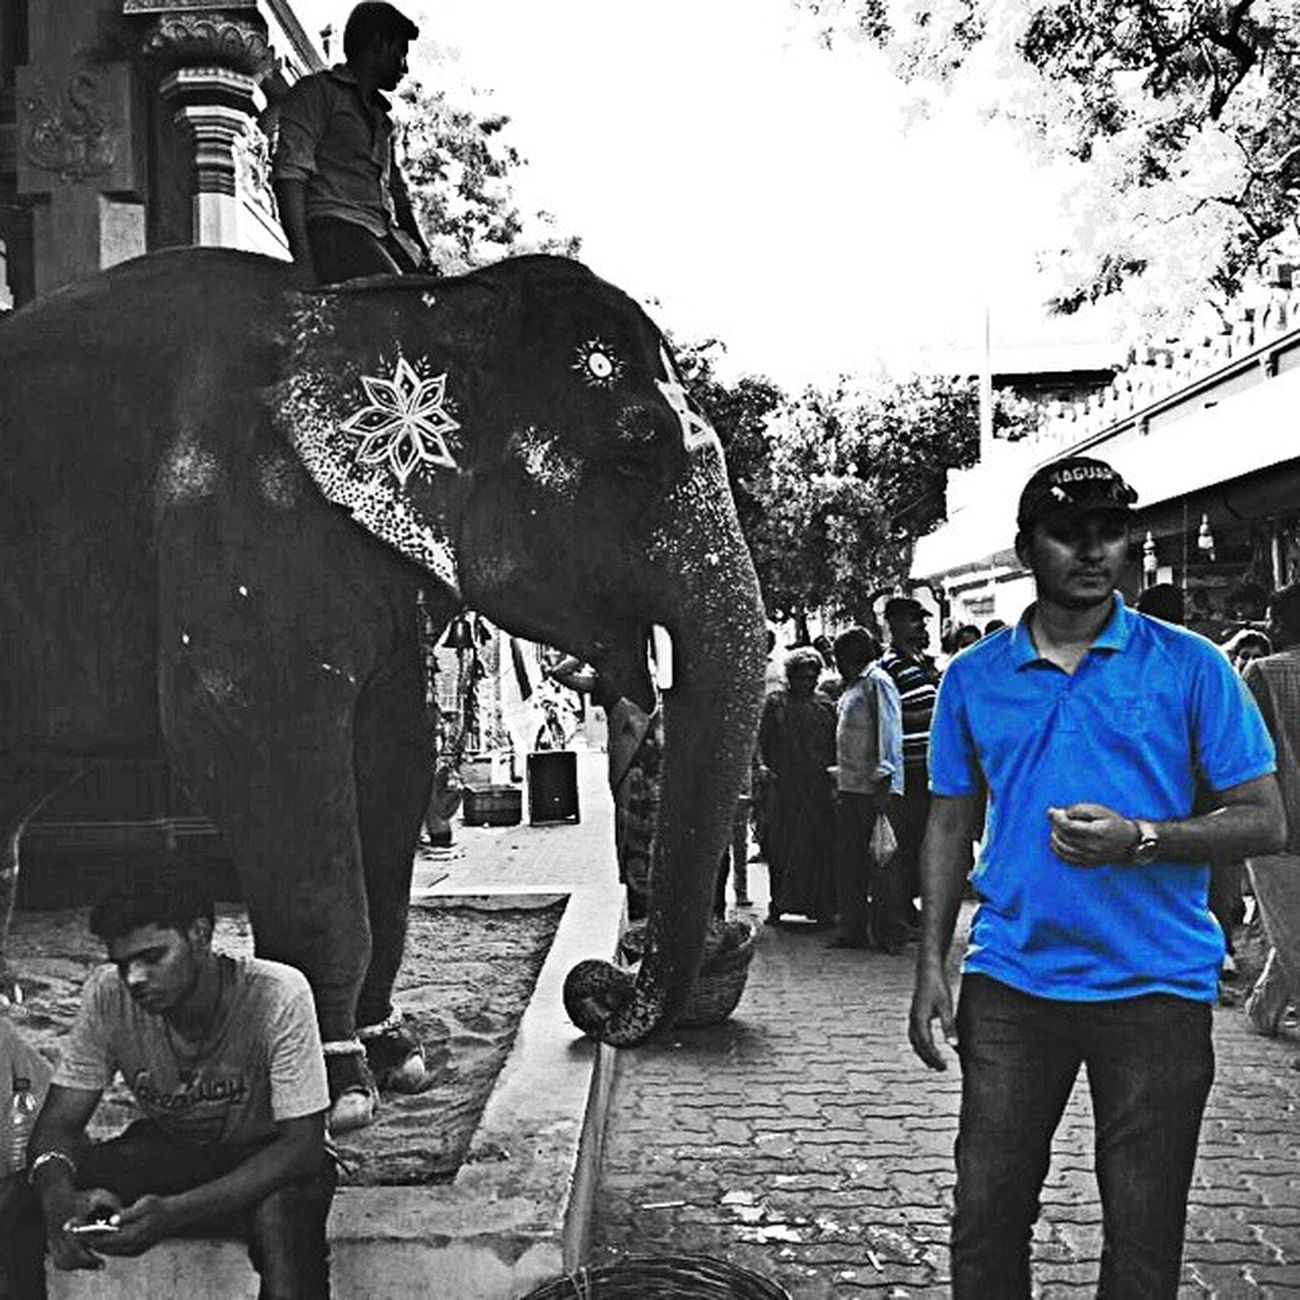 Pondicherry Pondybeaches Animalover _oye _cic _soi Streetphotography Bnw_india Blackandwhite F4F Followforfollow Follow4follow Blessings Elephants